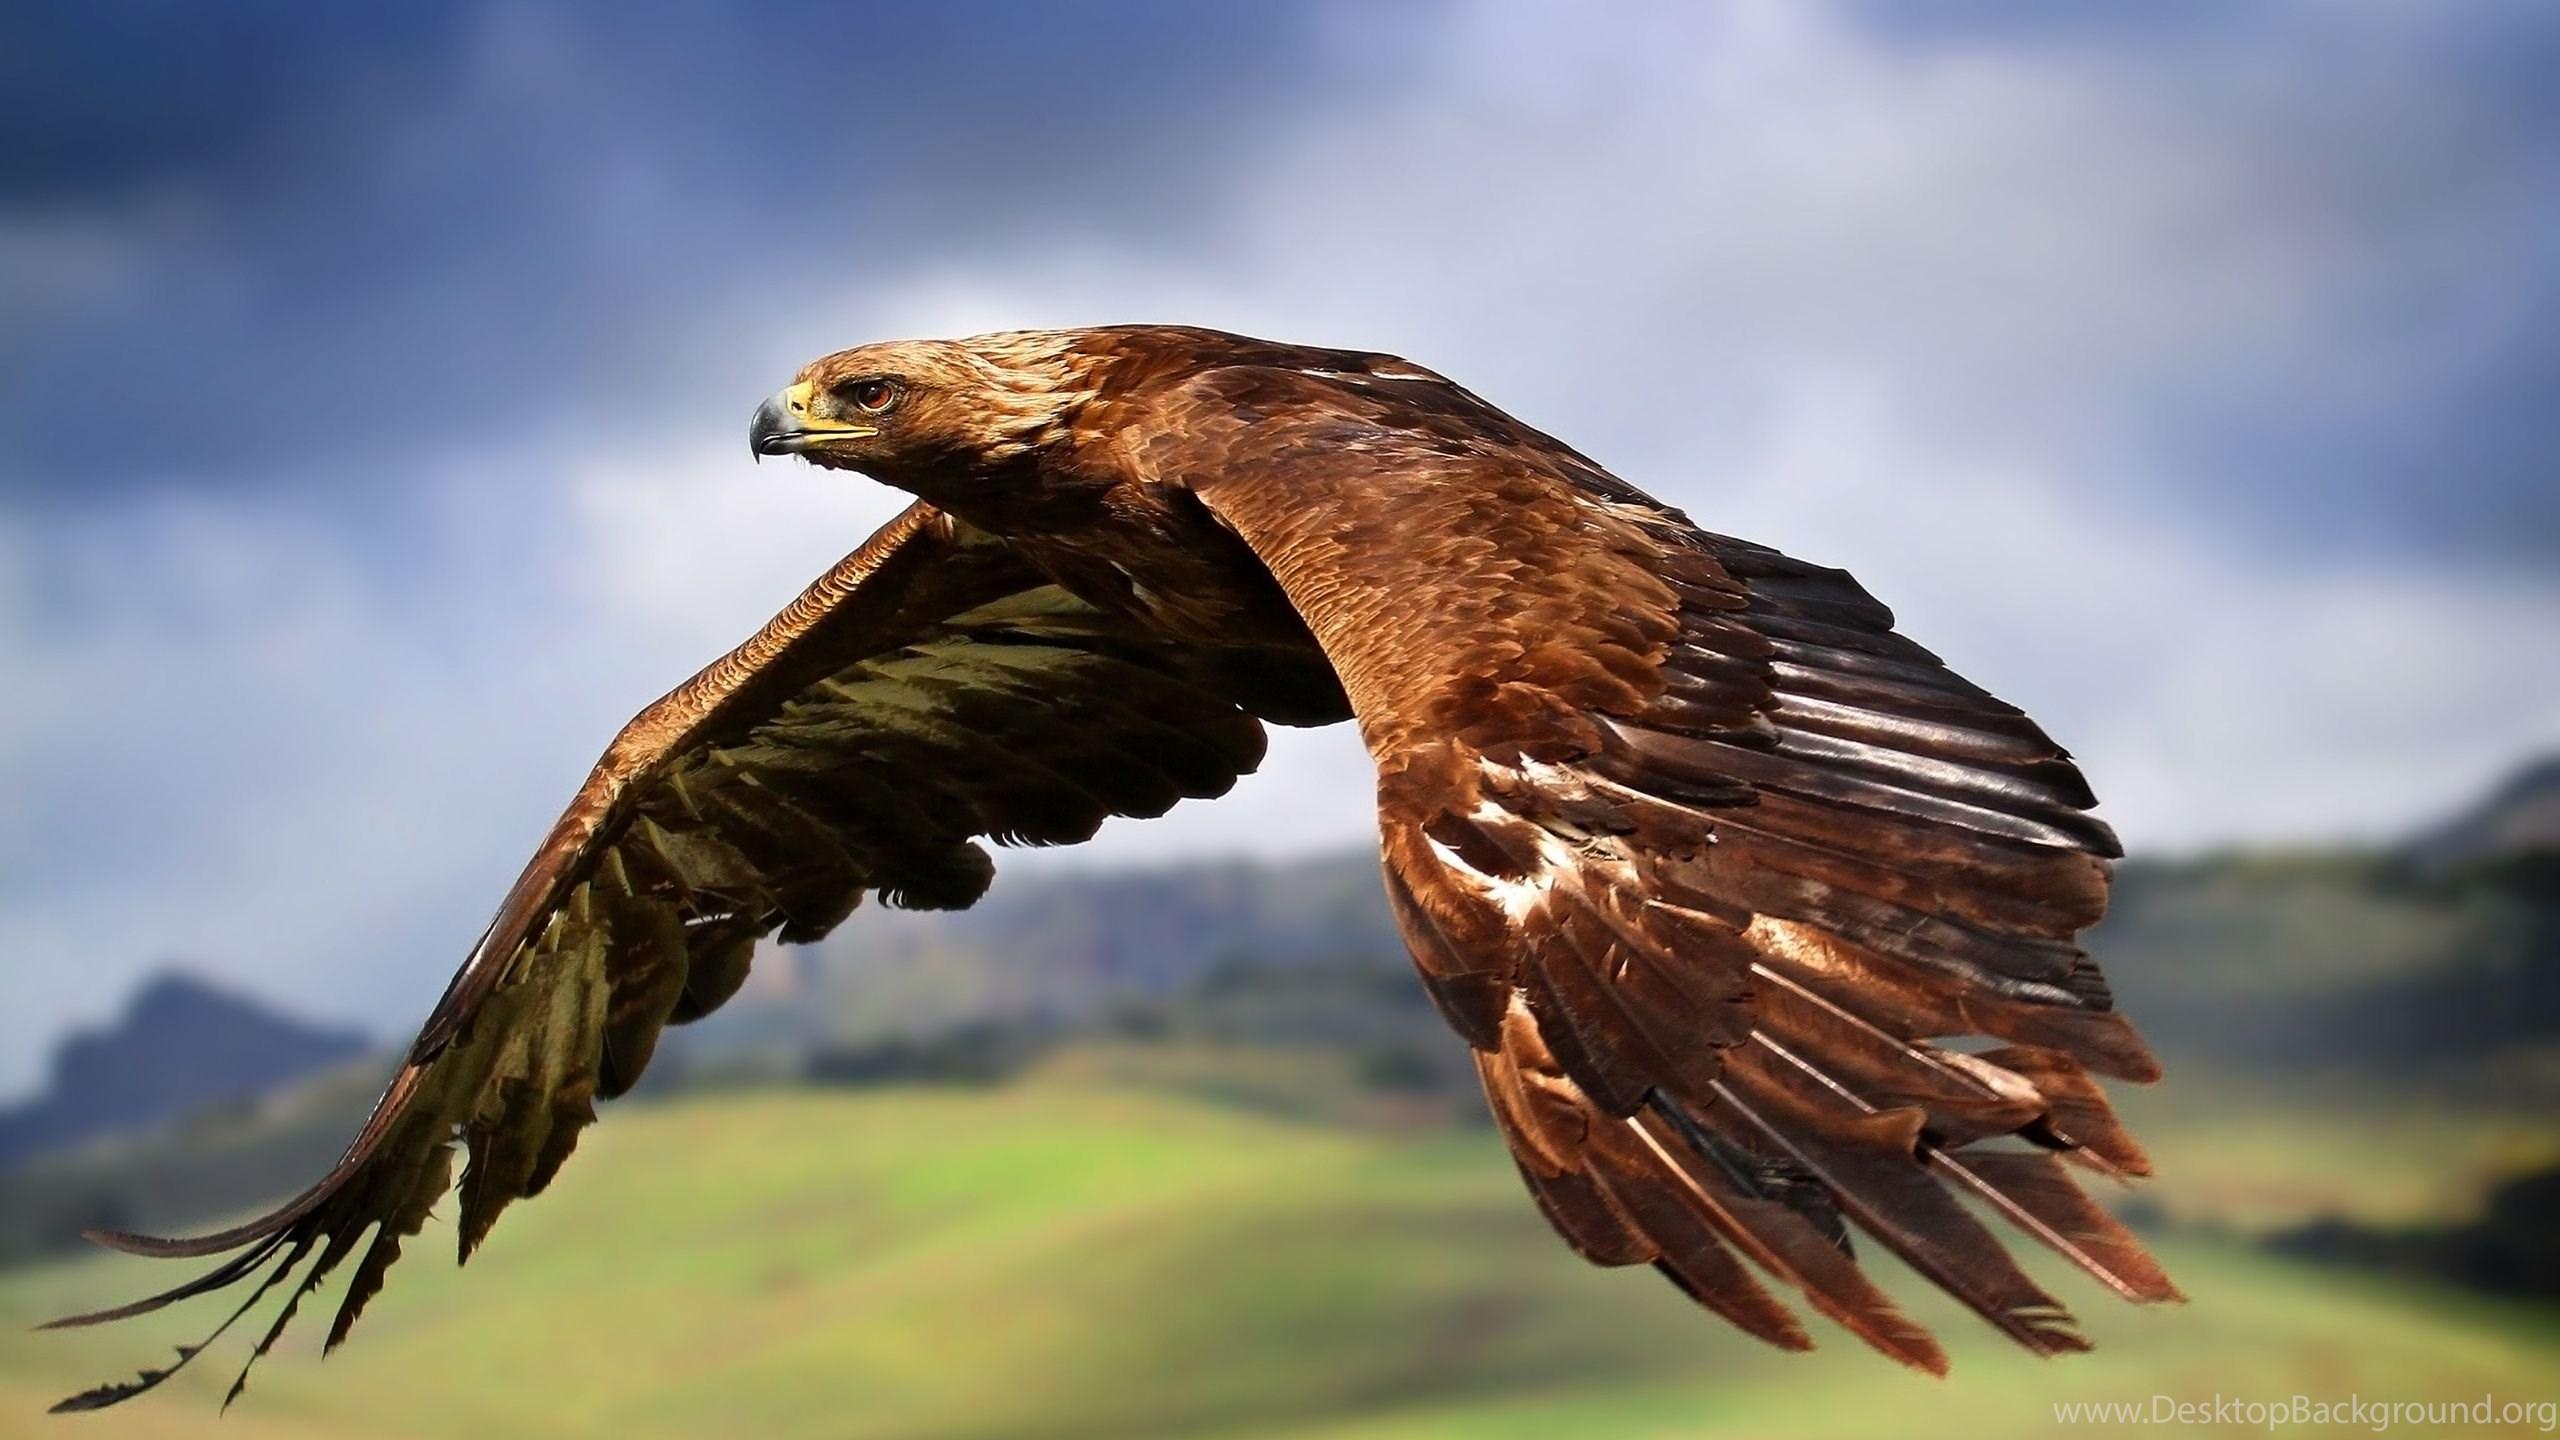 Download Eagle Wallpapers For Iphone Desktop Background